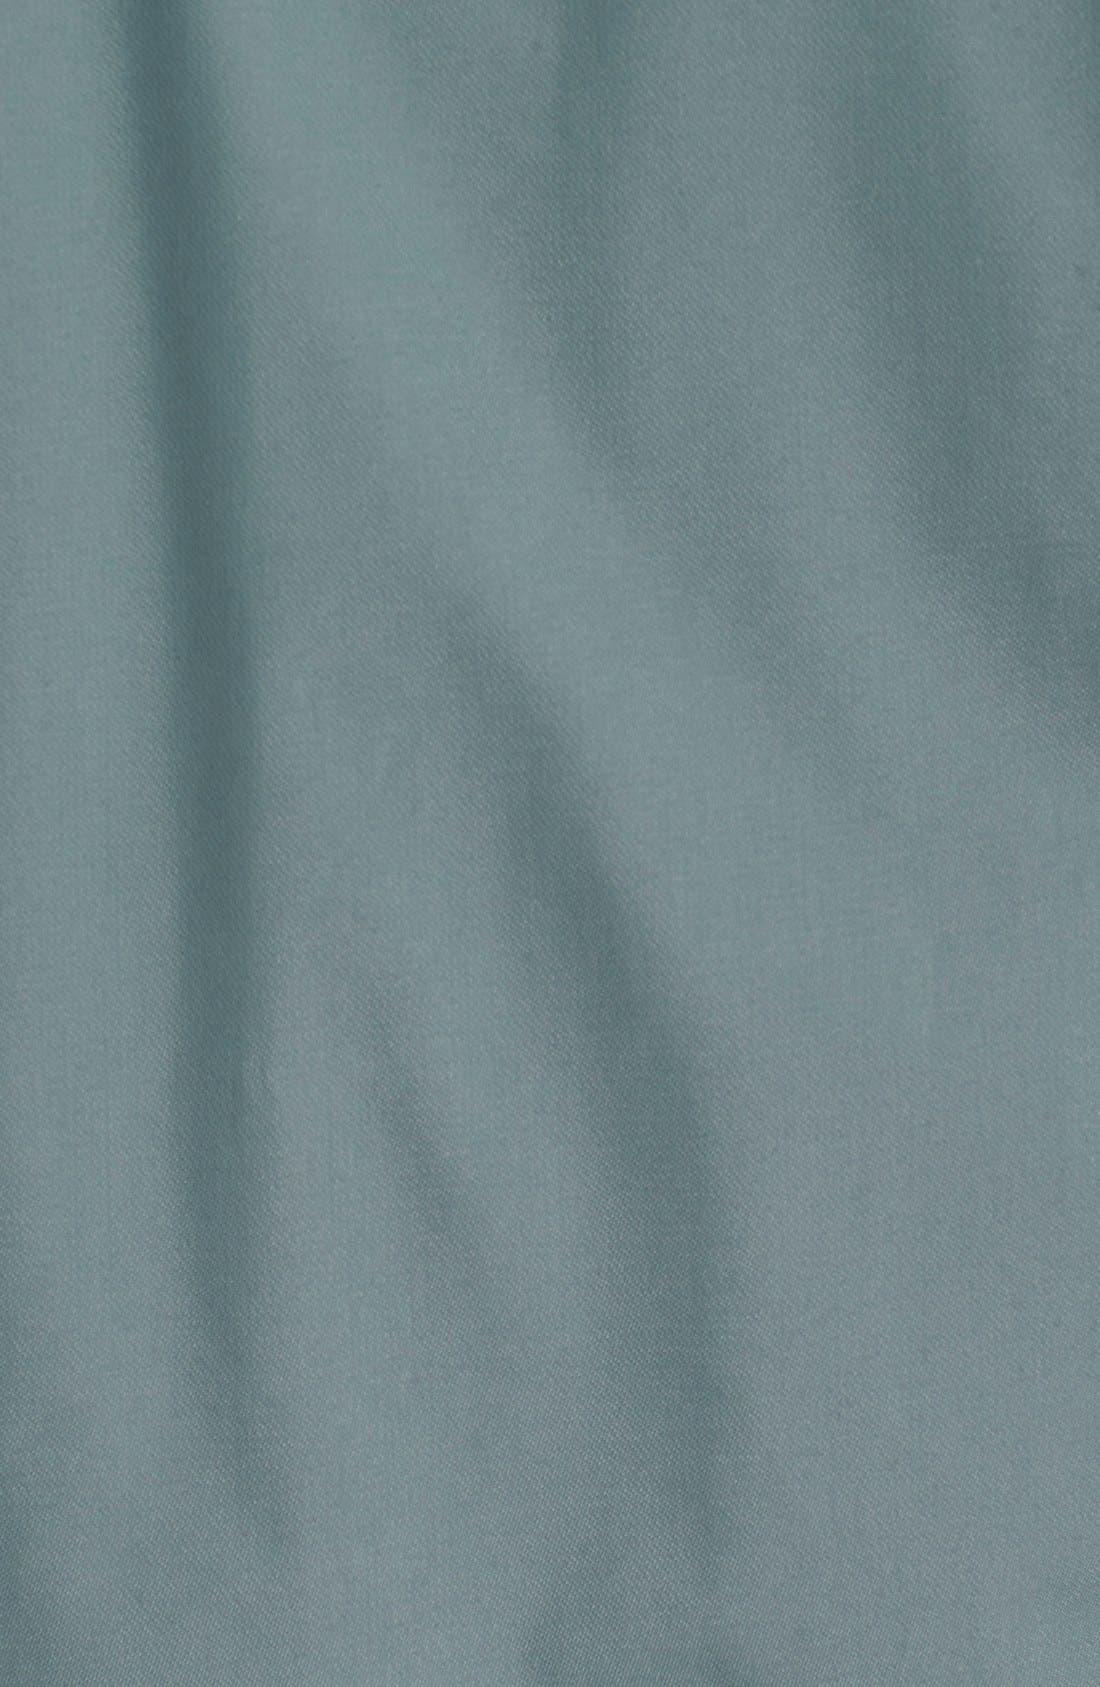 HellyHansen 'Universal' MotoRain Jacket,                             Alternate thumbnail 10, color,                             080